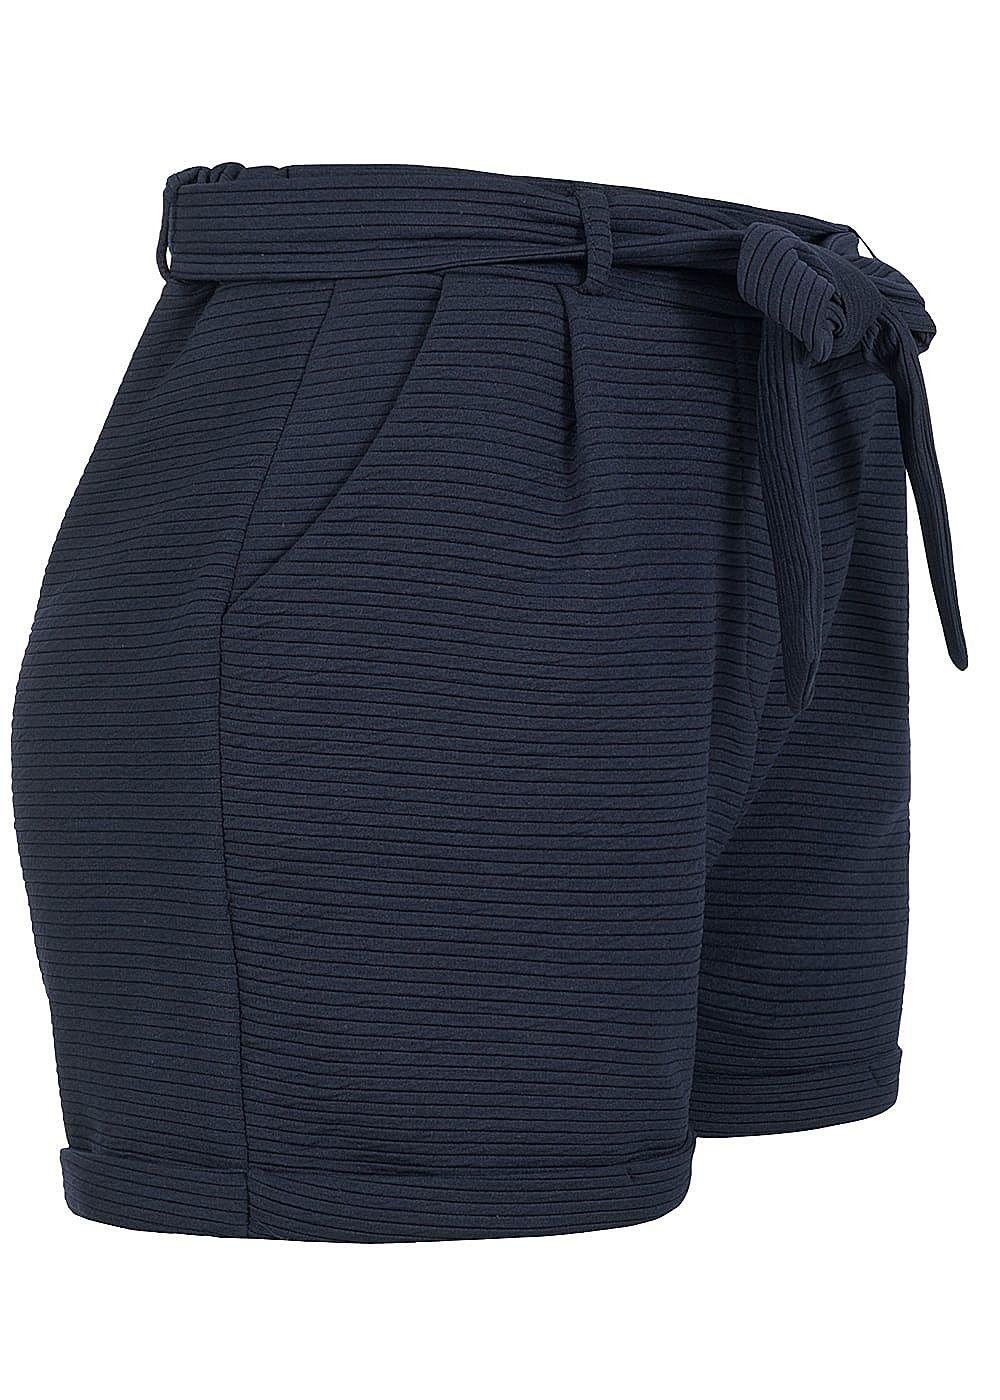 babce99d5e5ac7 Styleboom Fashion Damen Paper-Bag Shorts inkl. Gürtel Ripp-Muster ...